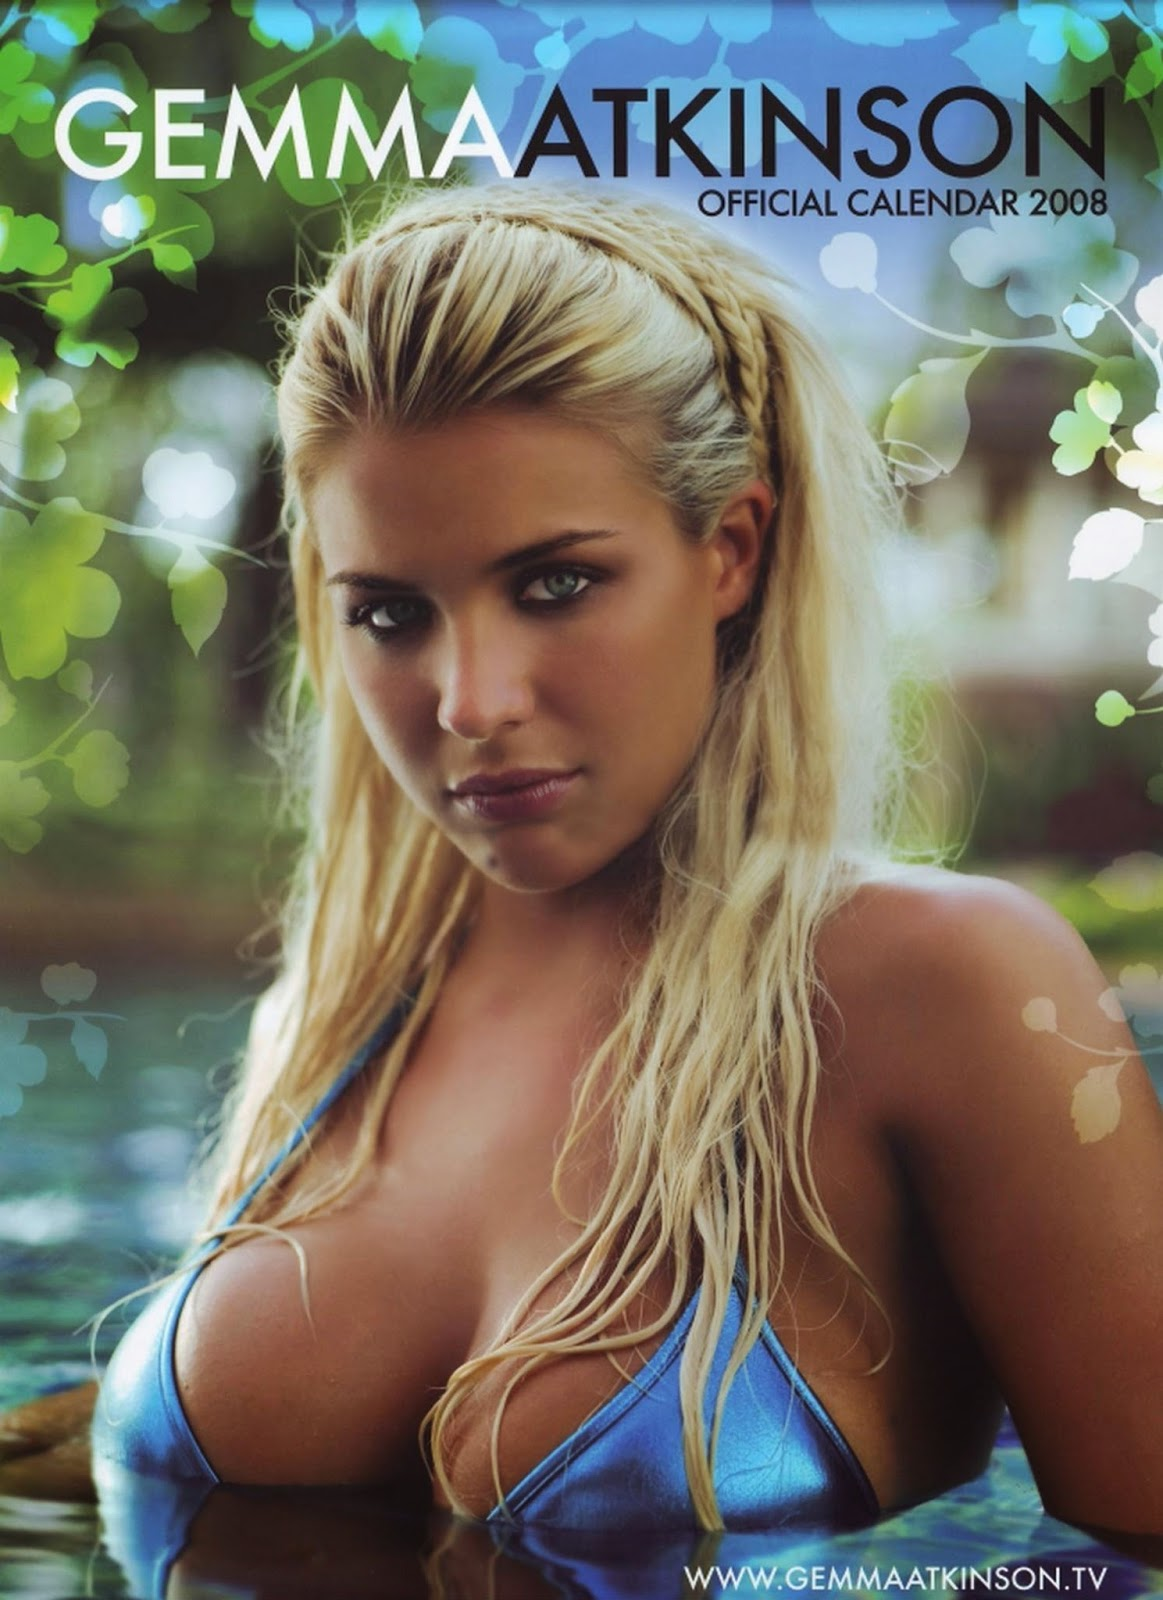 Gemma Atkinson Hot Bikini Calendar Photos Mega Gallery